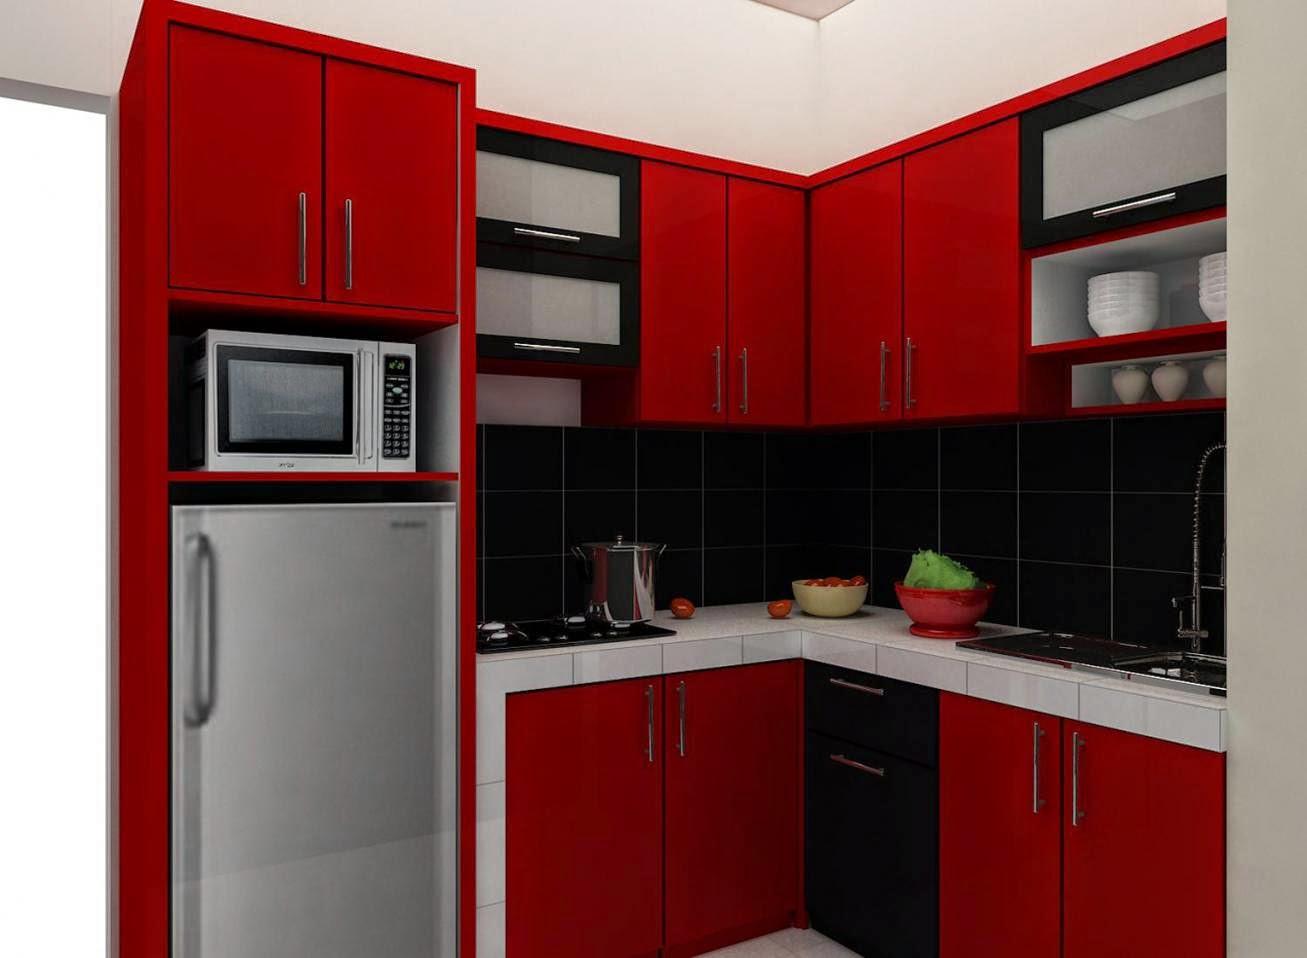 Harga Set Dapur Minimalis Mempunyai Buat Kitchen Set Bandung